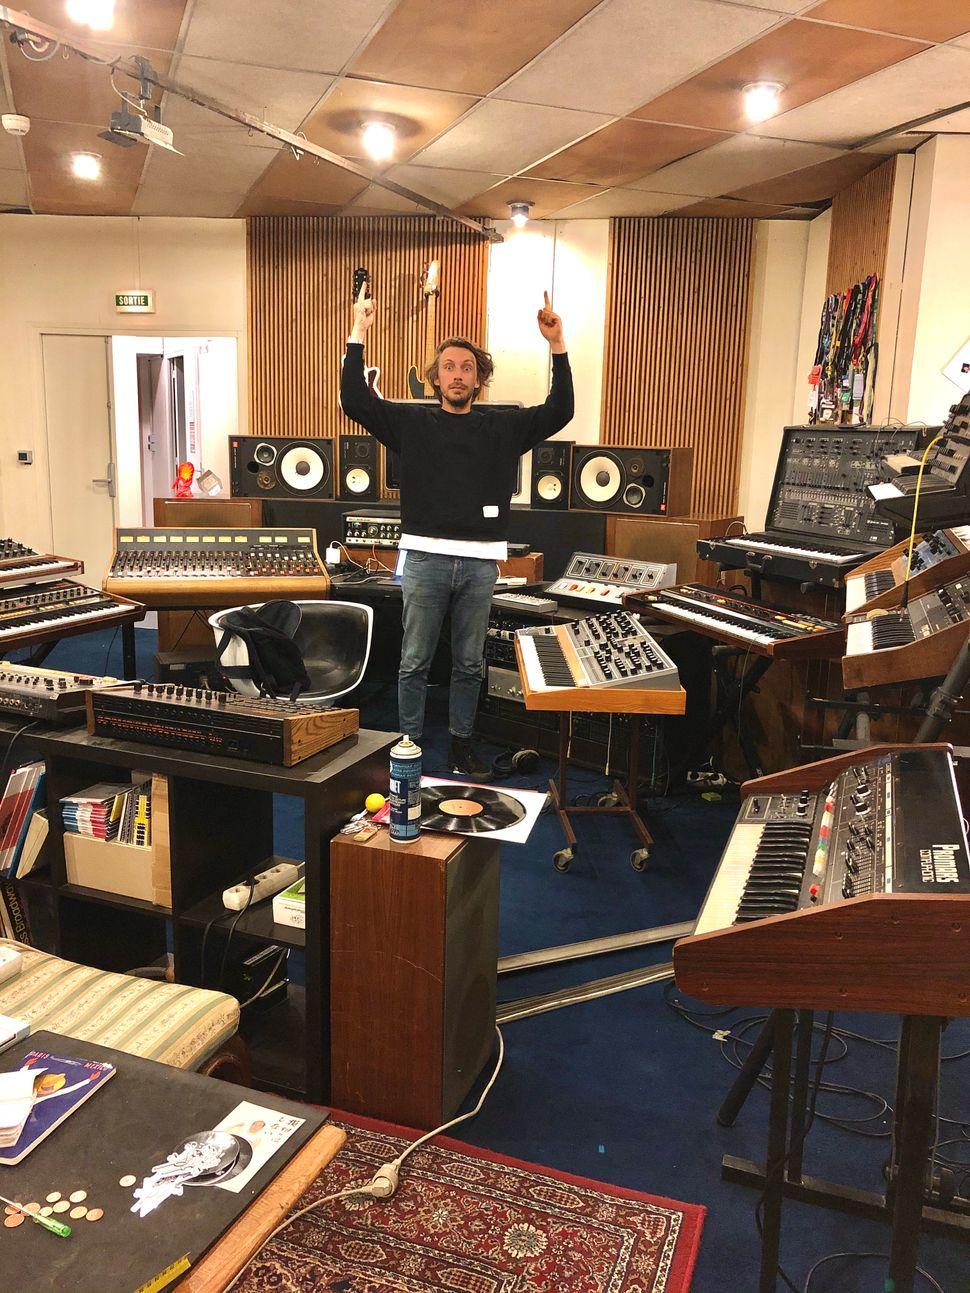 Yuksek dans son studio à